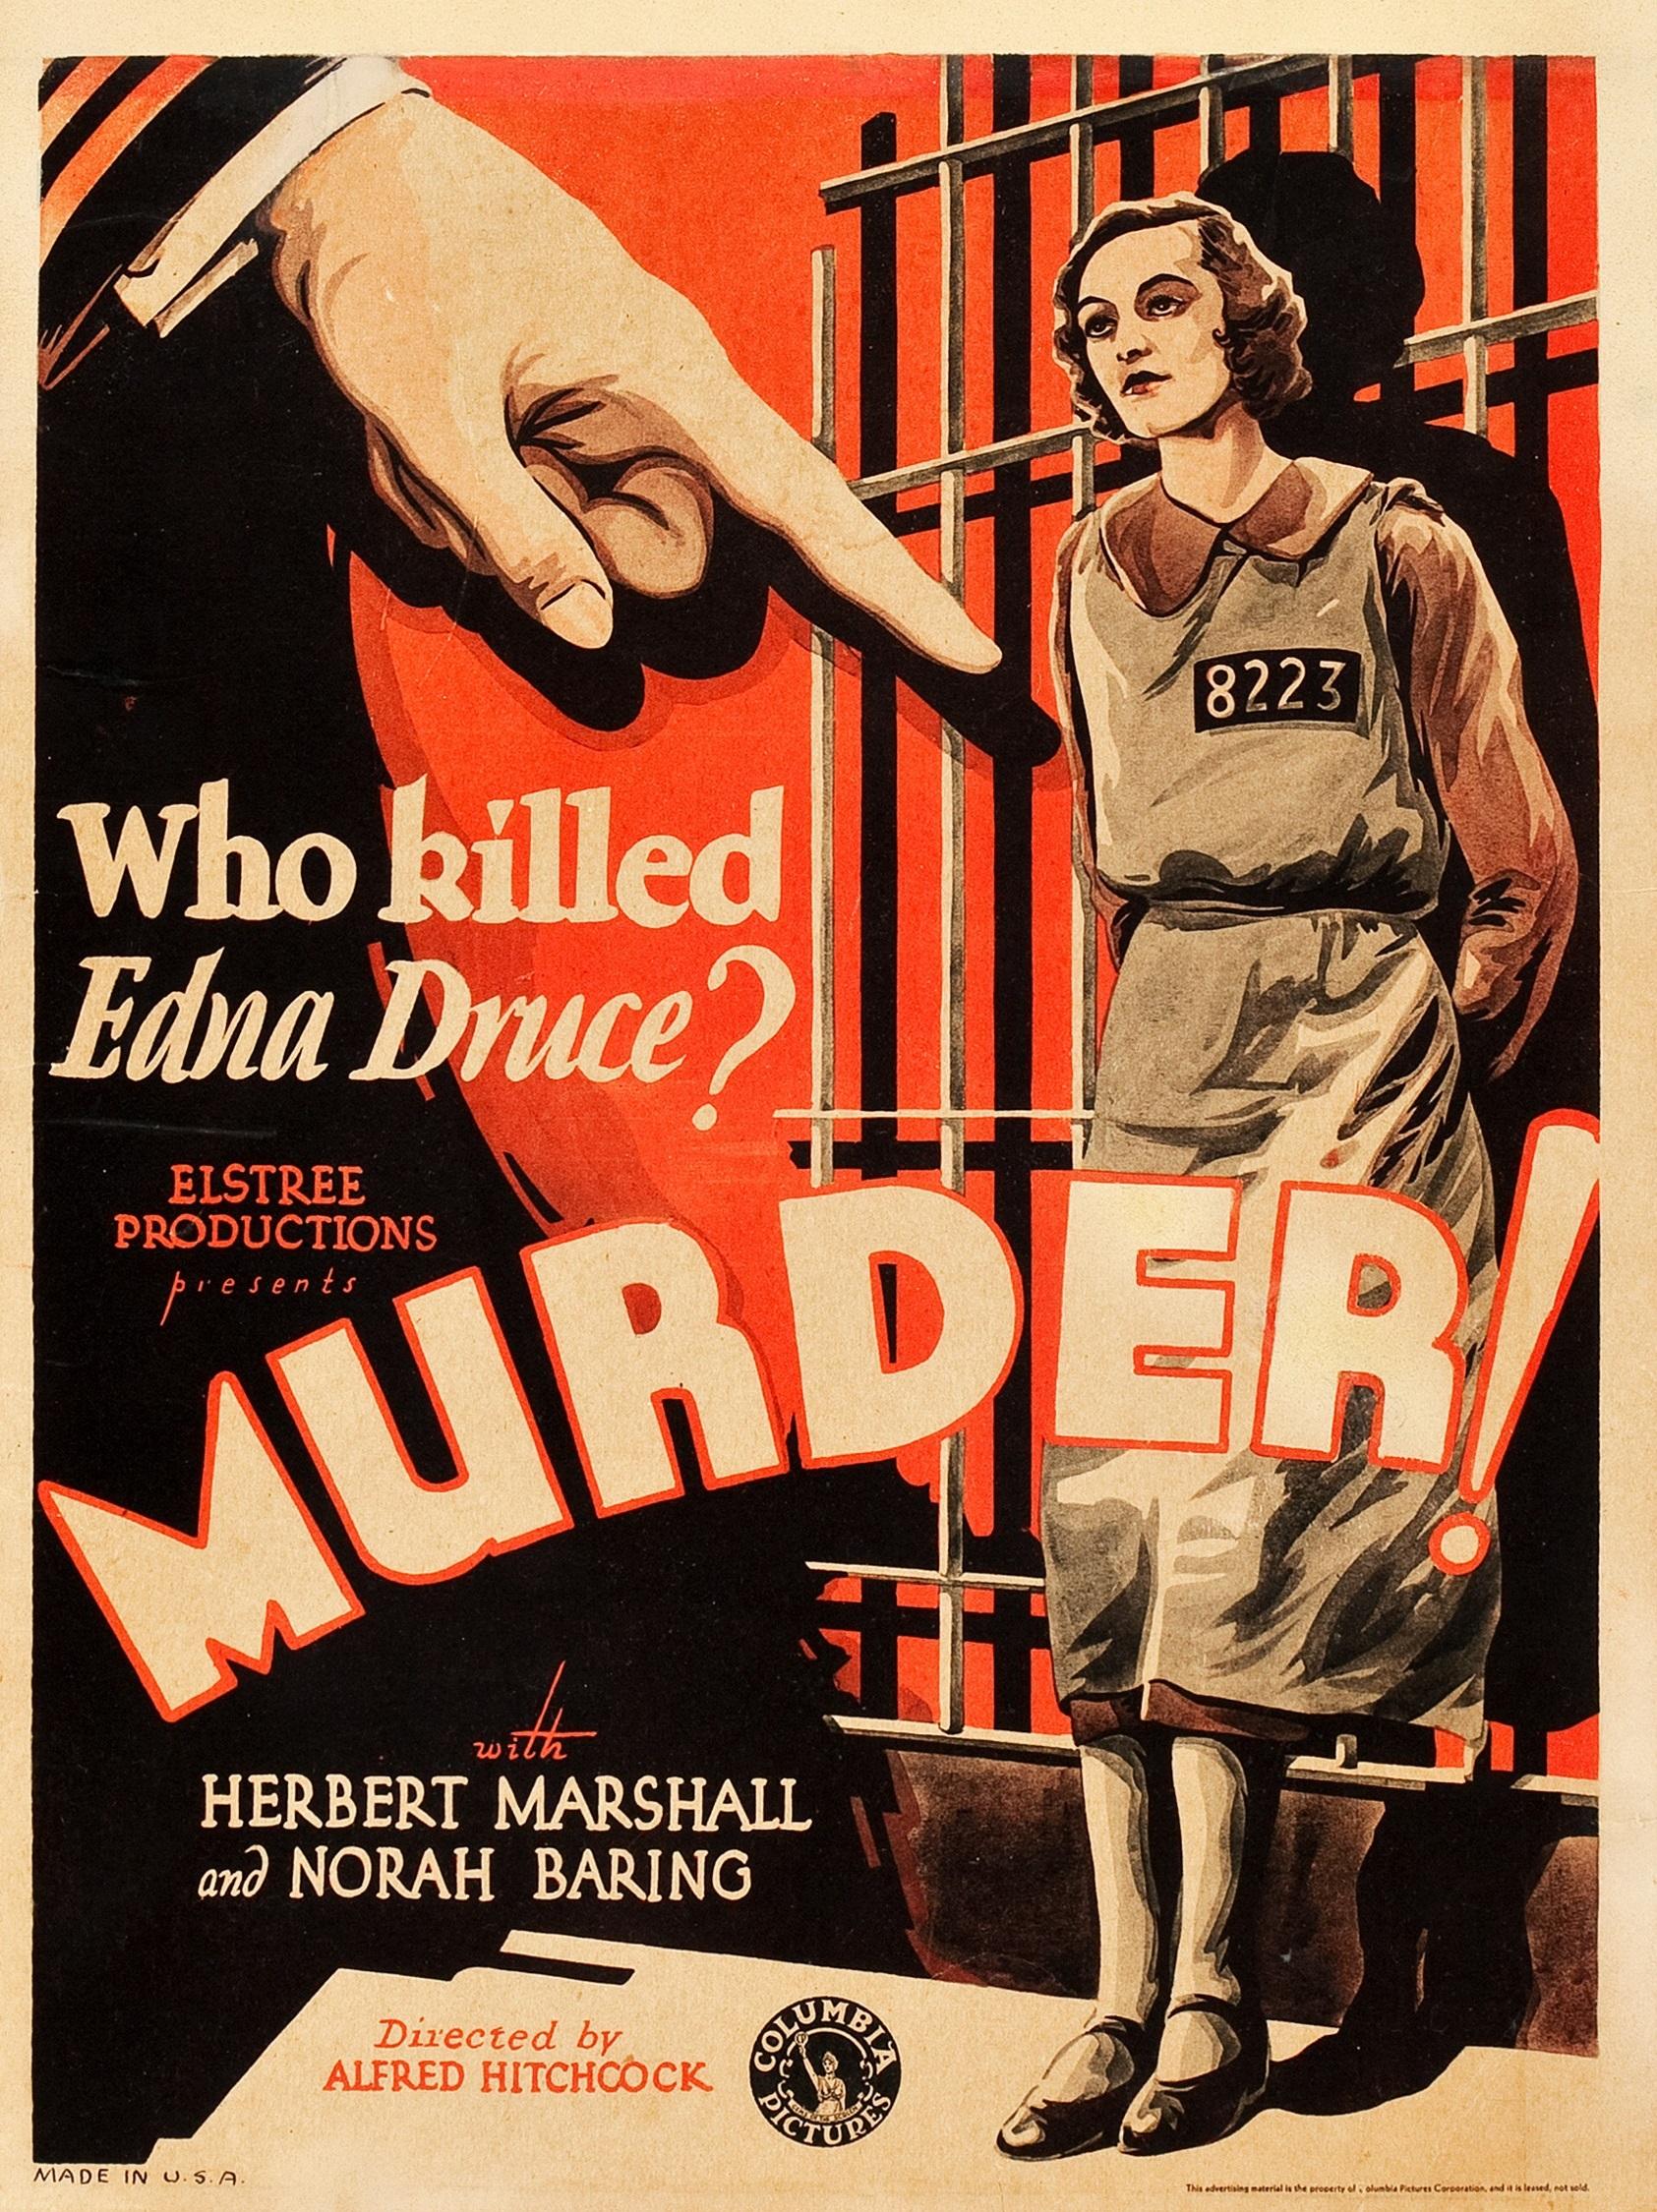 Murder! (1930, dir. Alfred Hitchcock) US window card